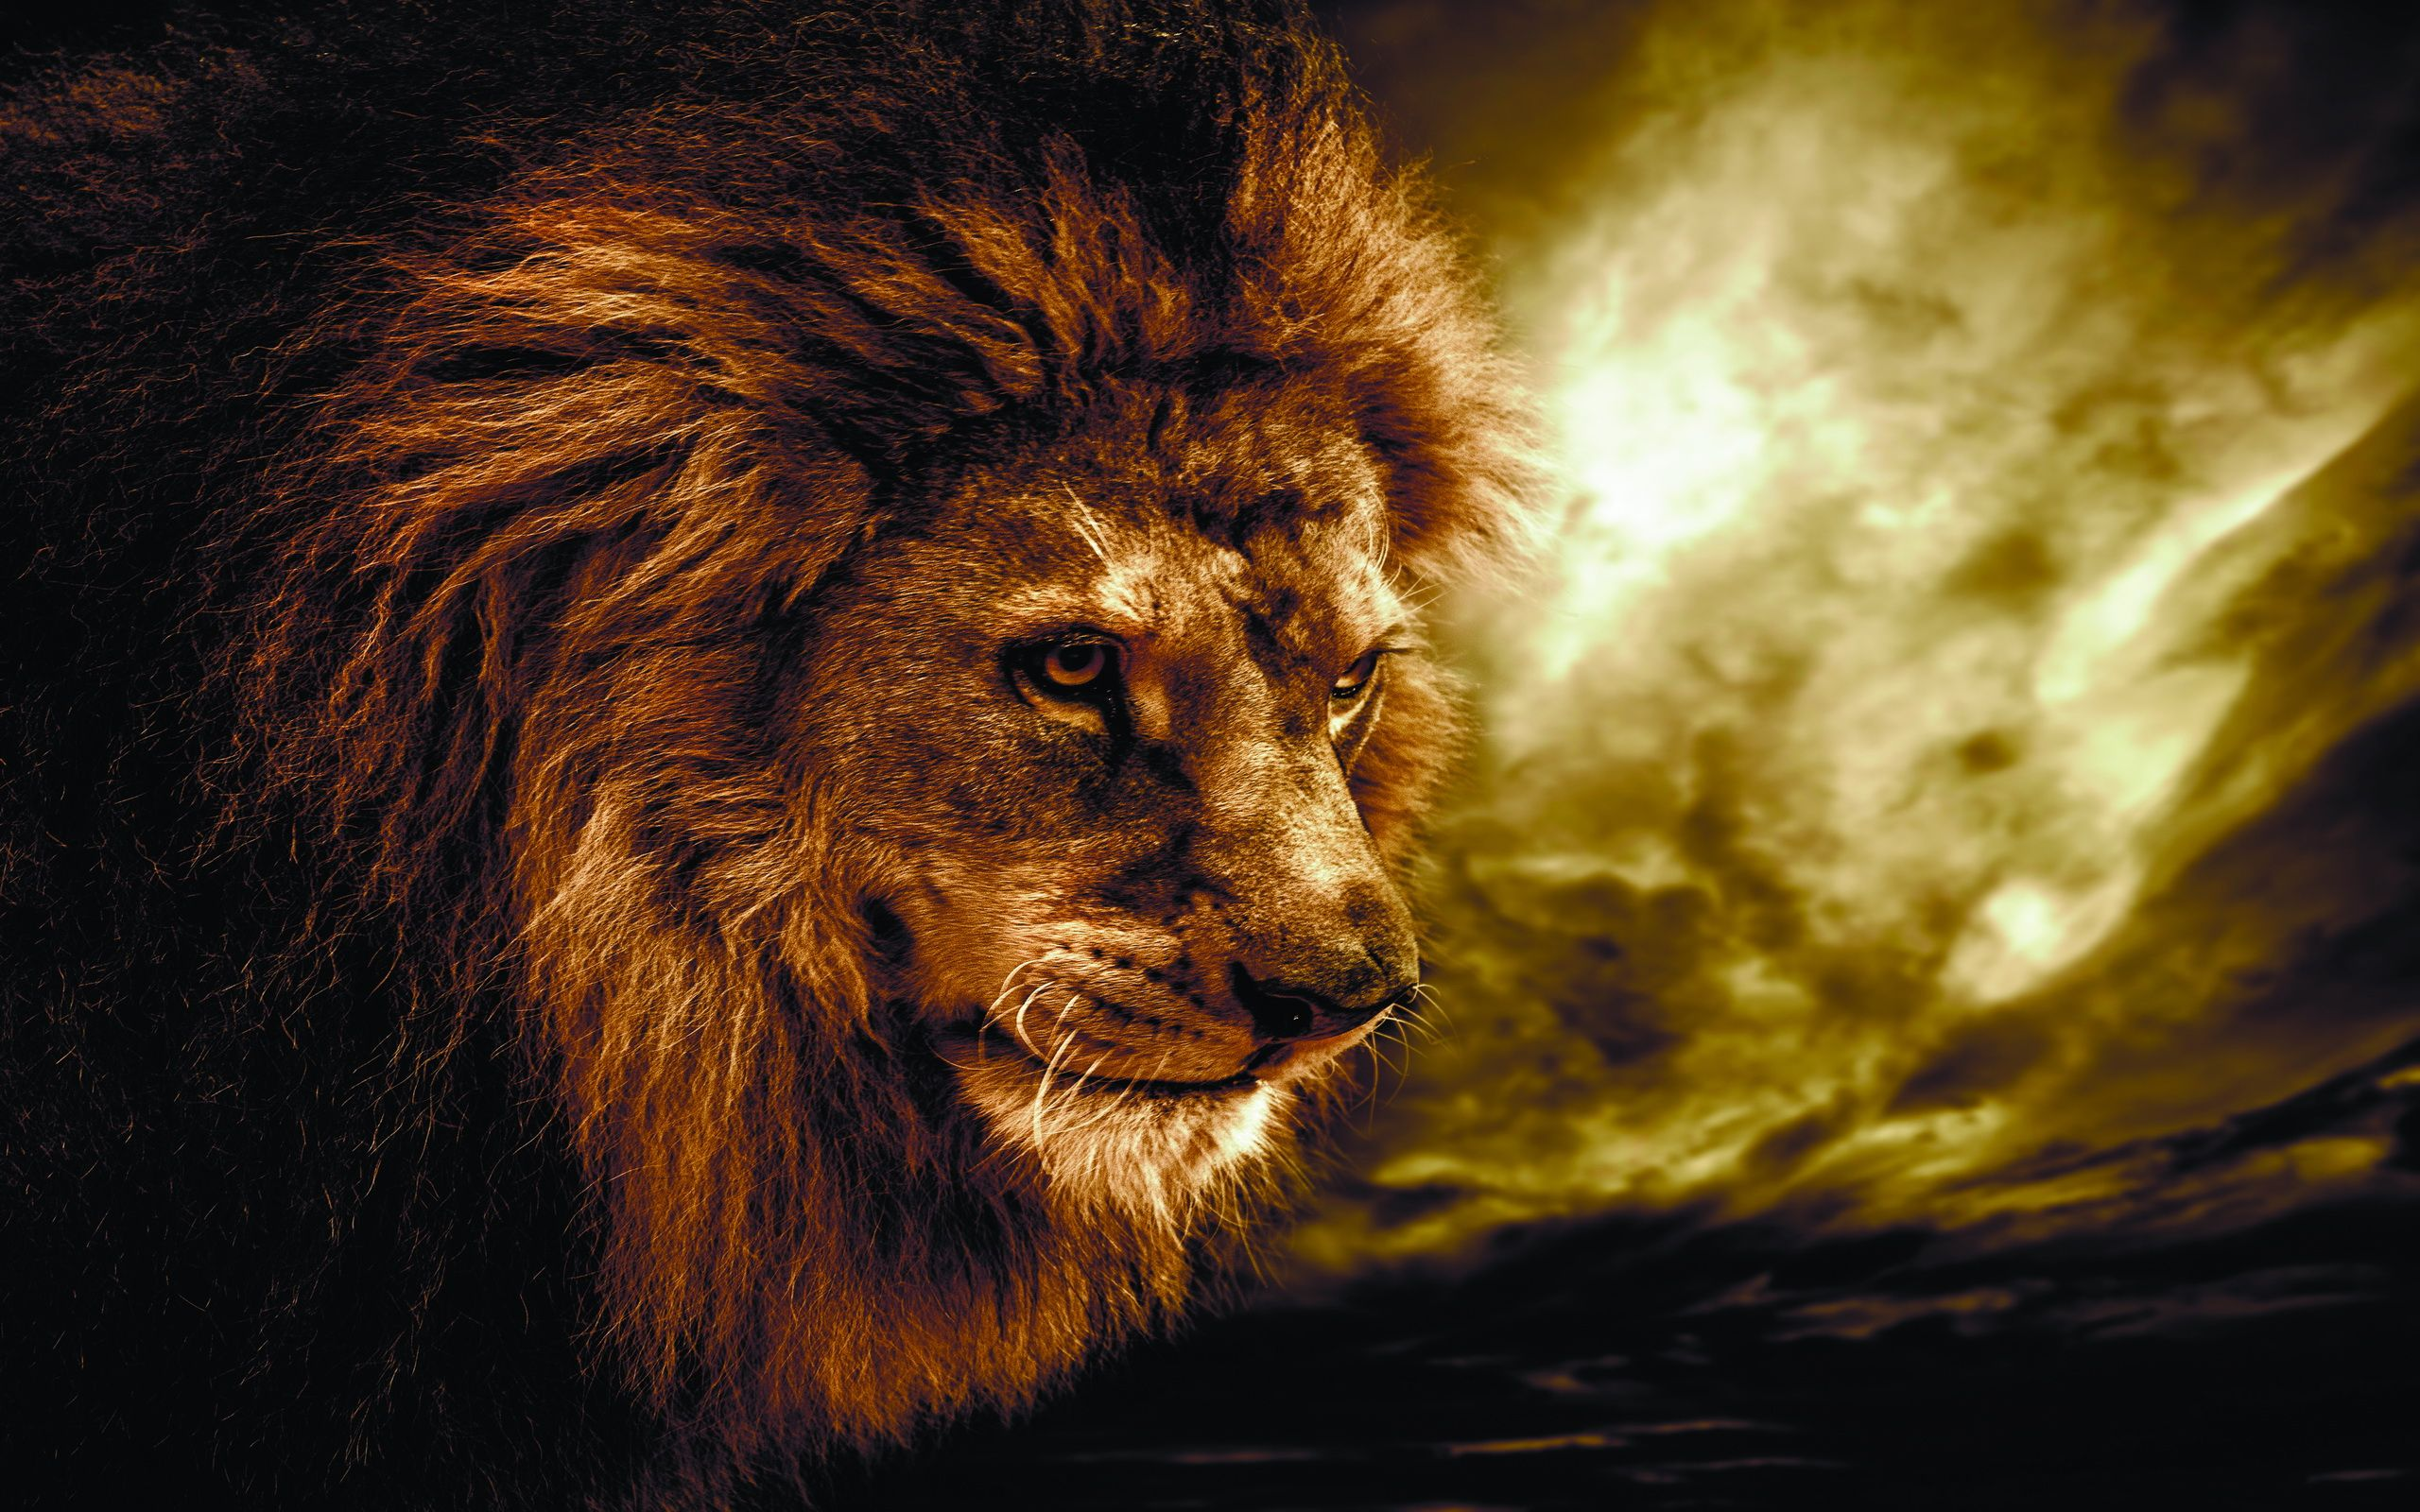 Wallpaper download lion - Lion Hd Wallpapers Download